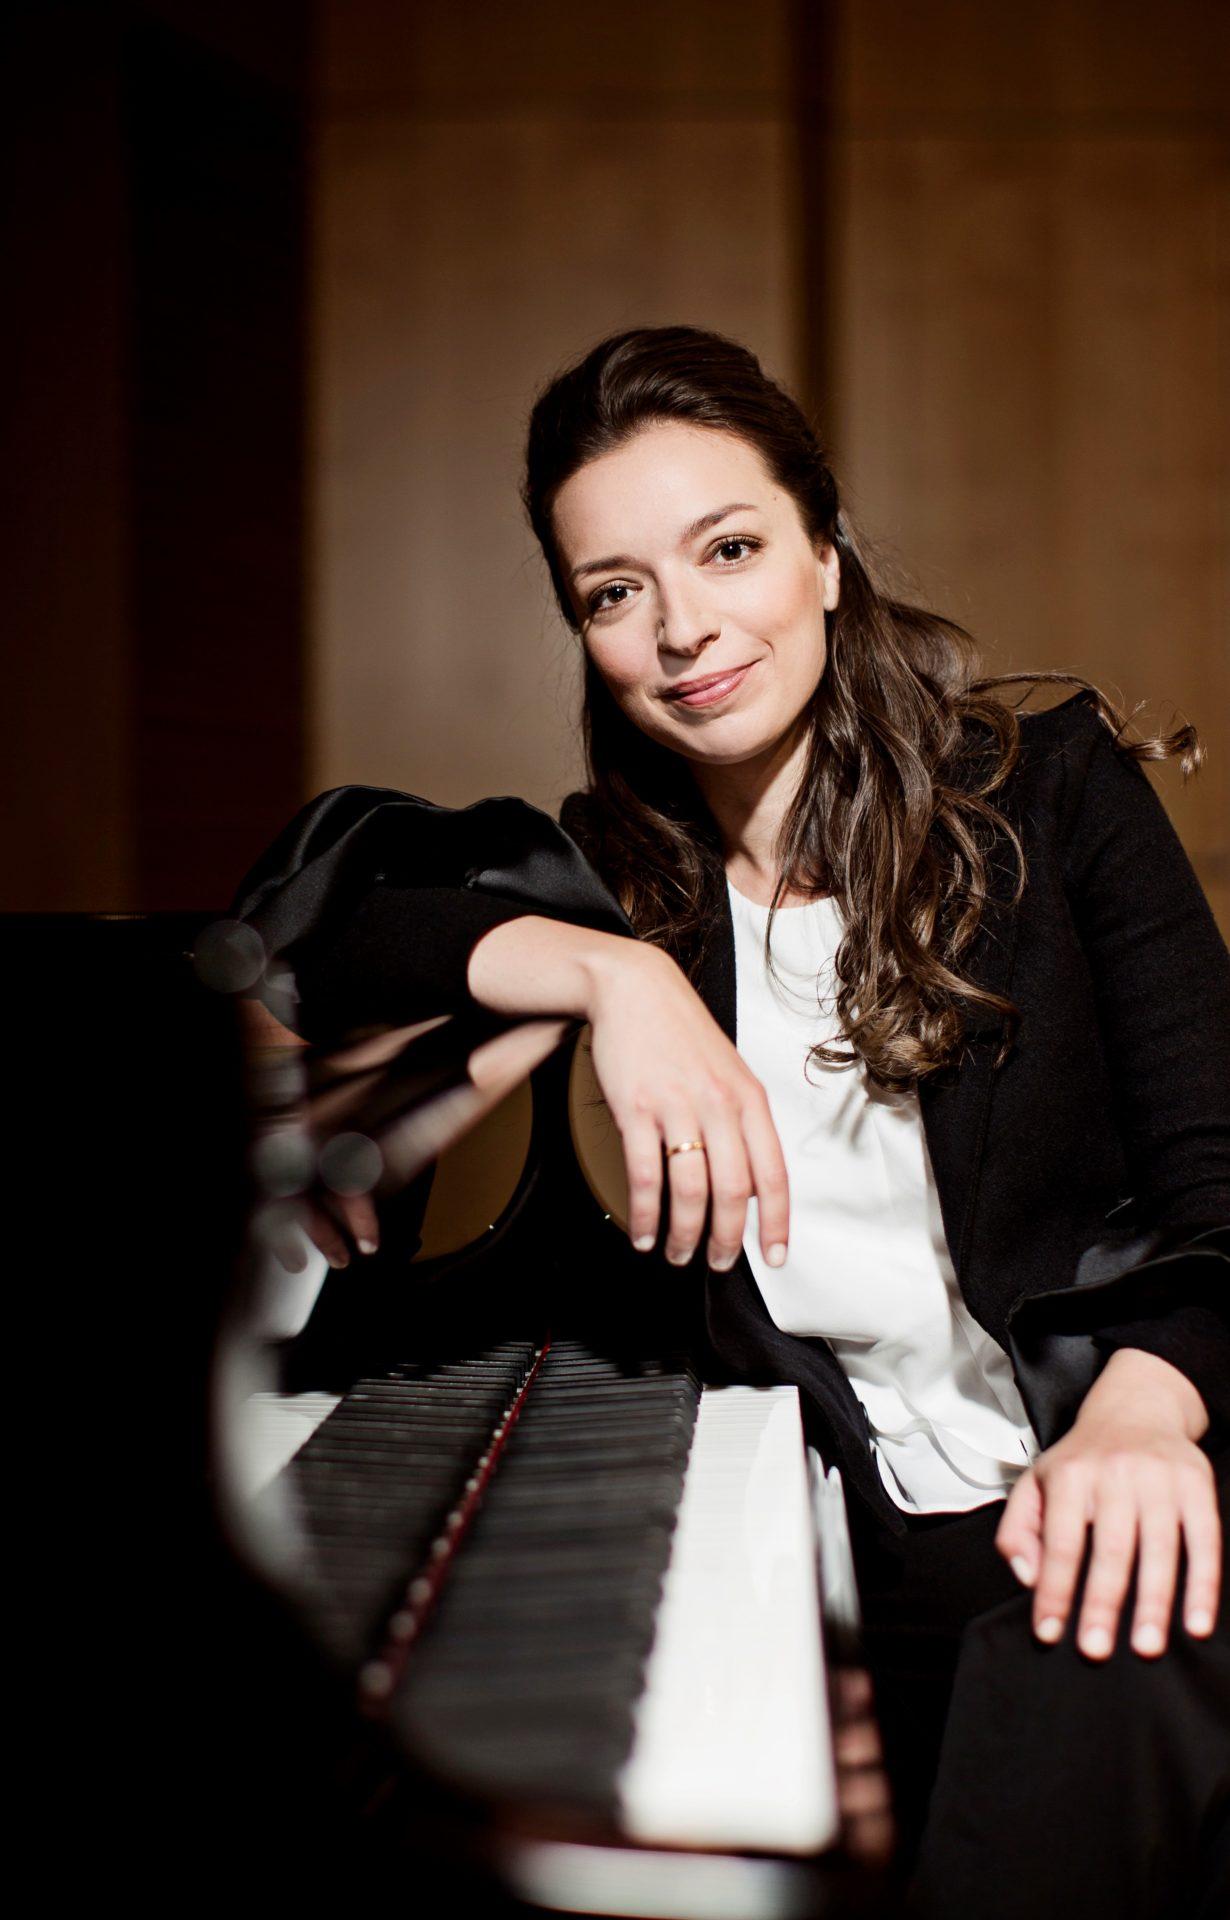 Klavierissimo: Yulianna Avdeeva